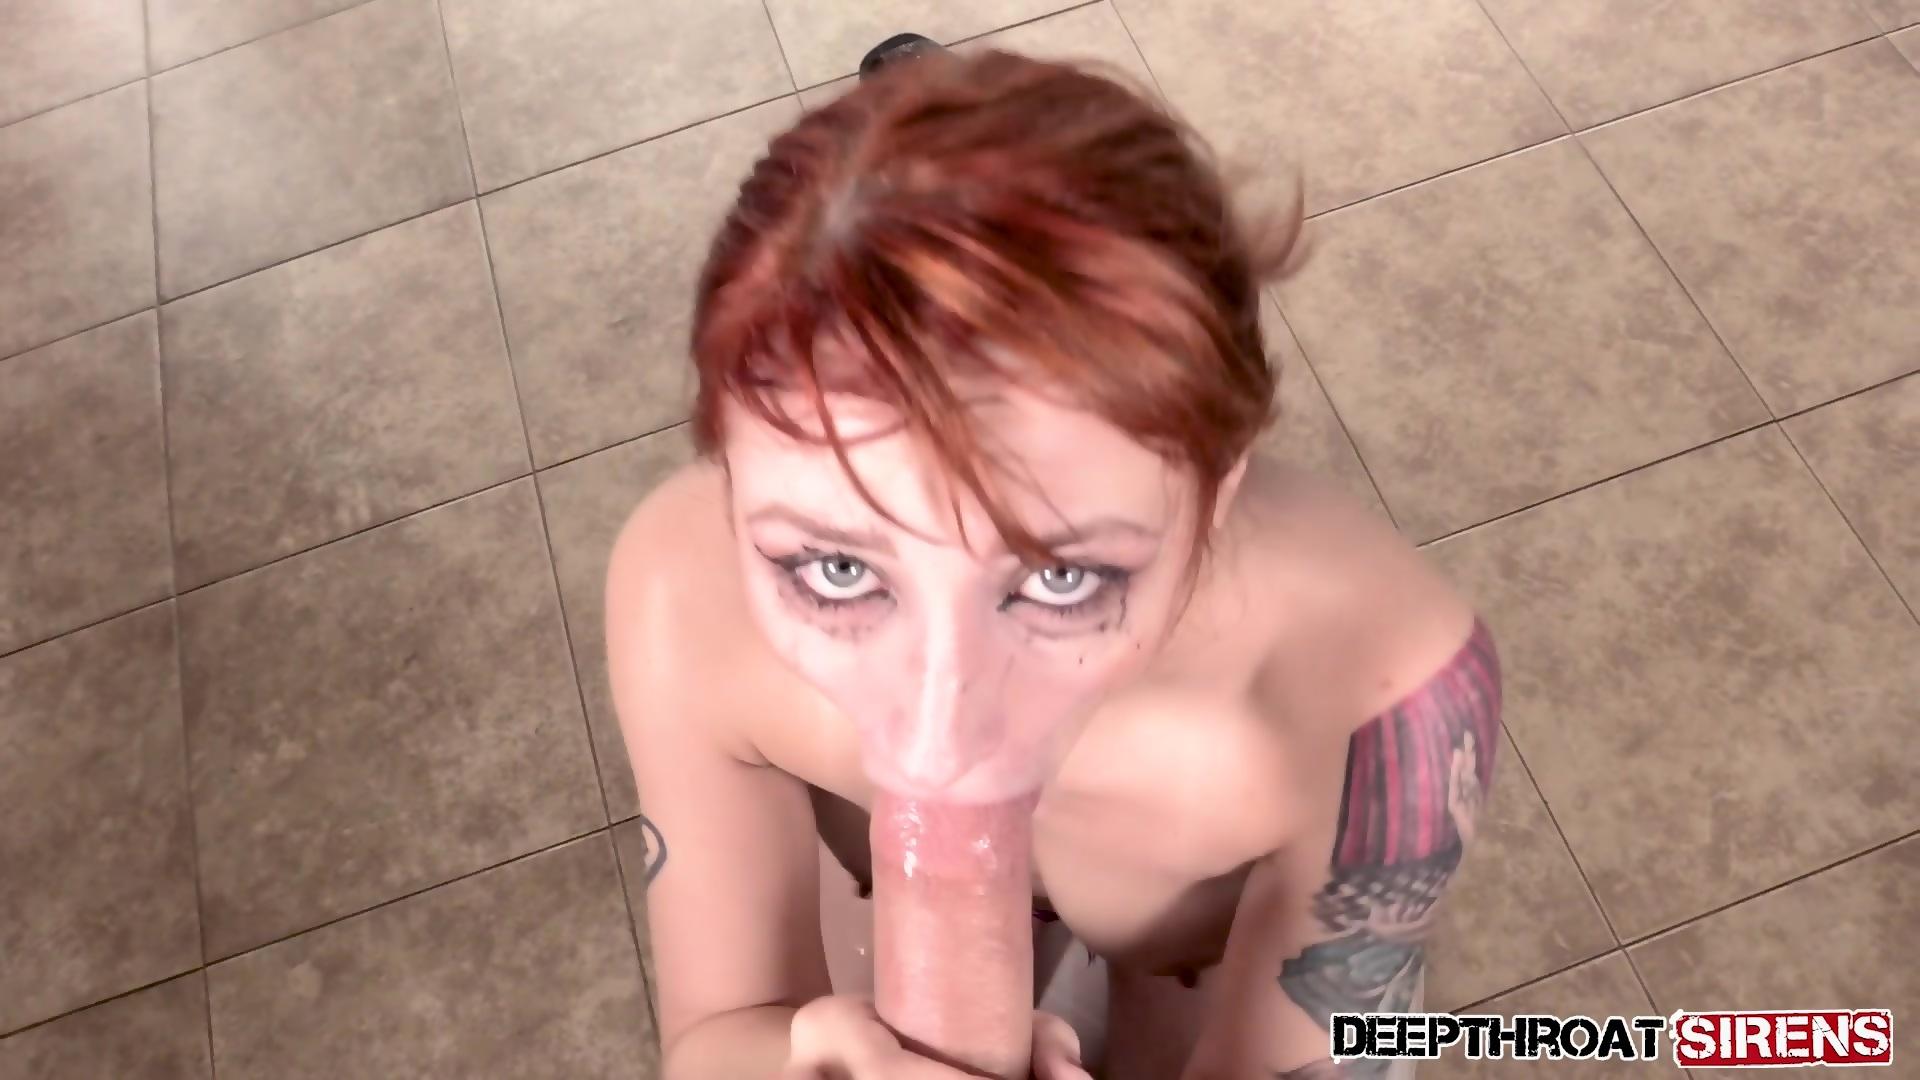 Hot Nude 18+ Chloe vevrier pics